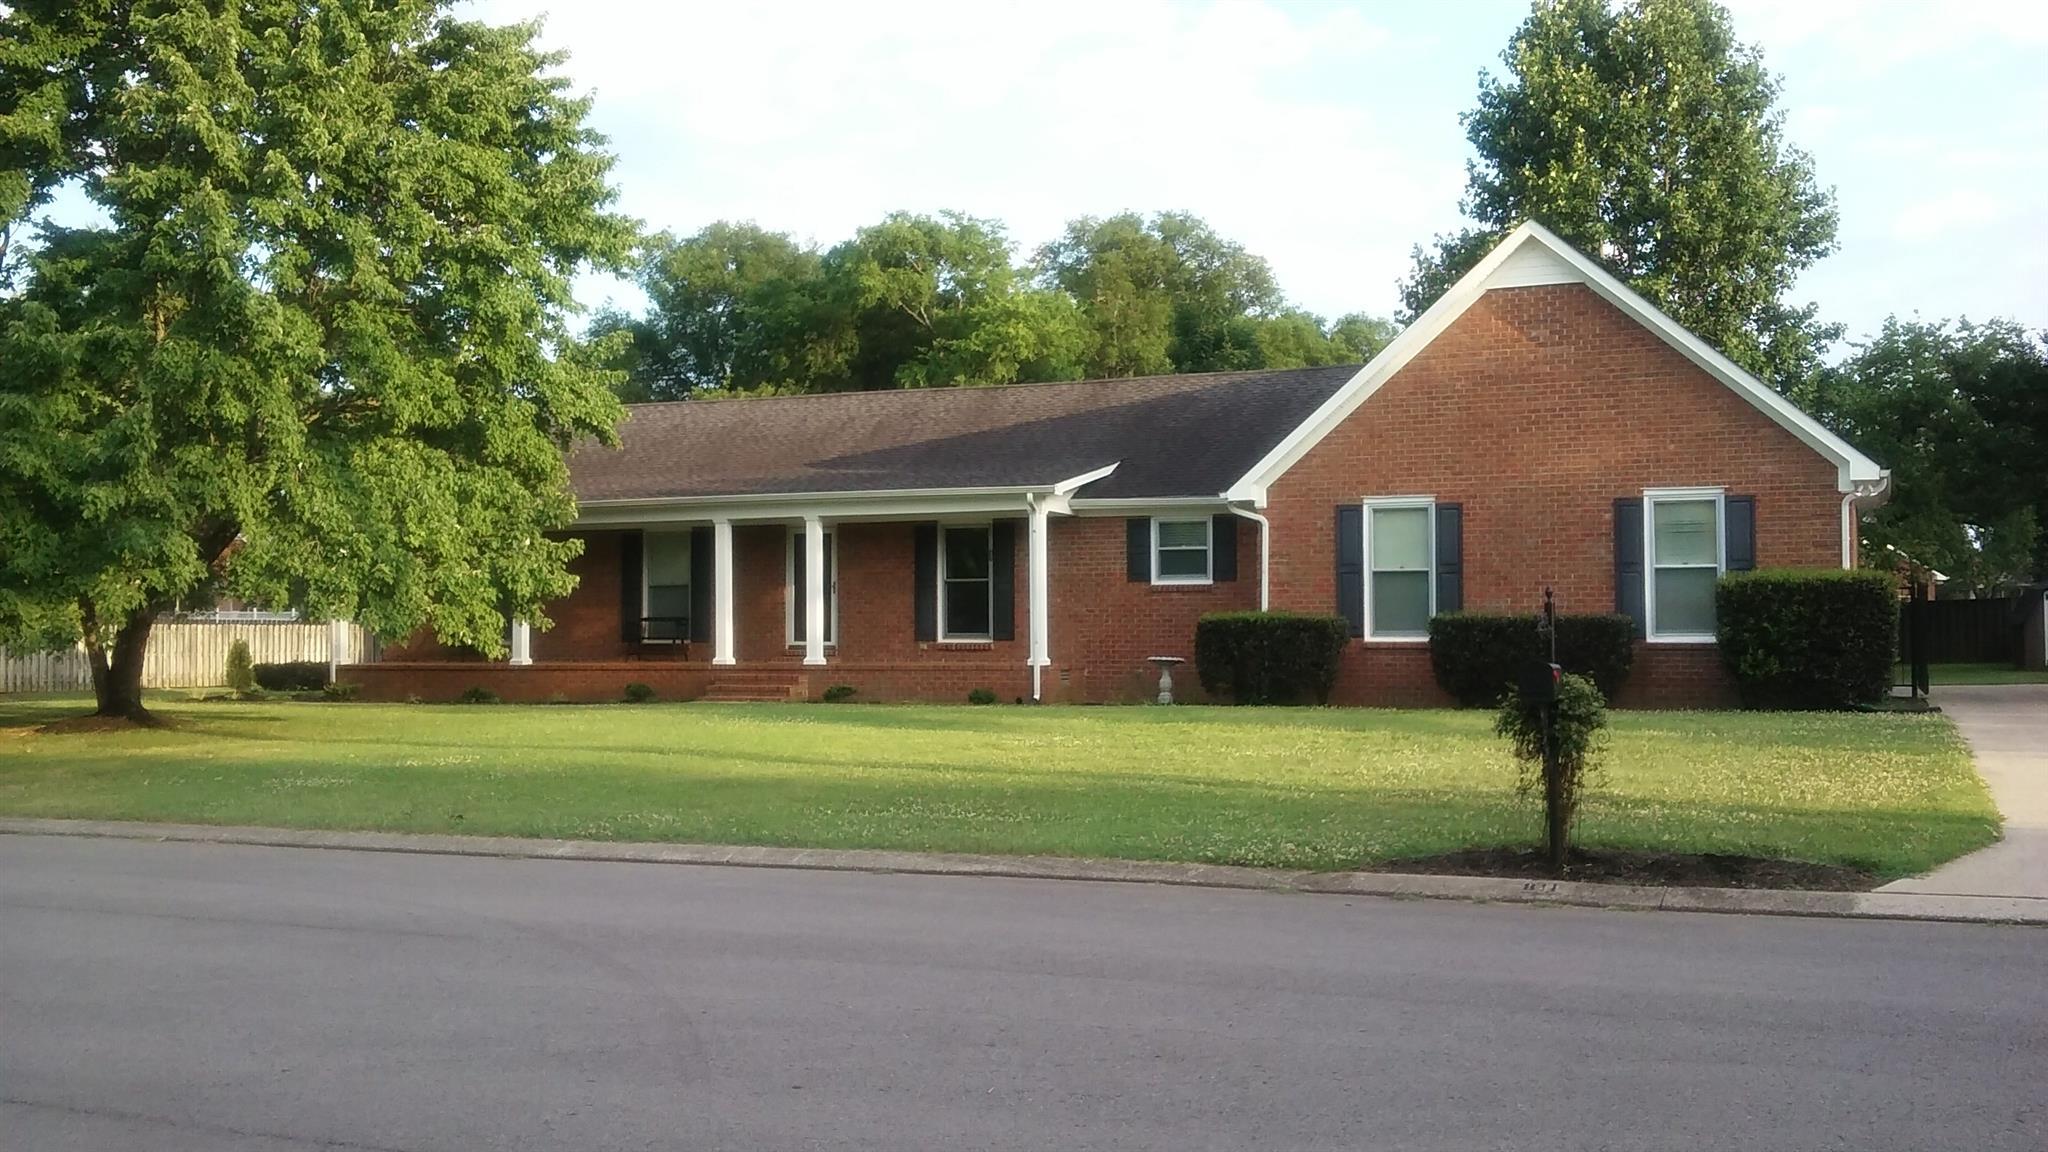 Photo of 811 Banner Dr  Murfreesboro  TN